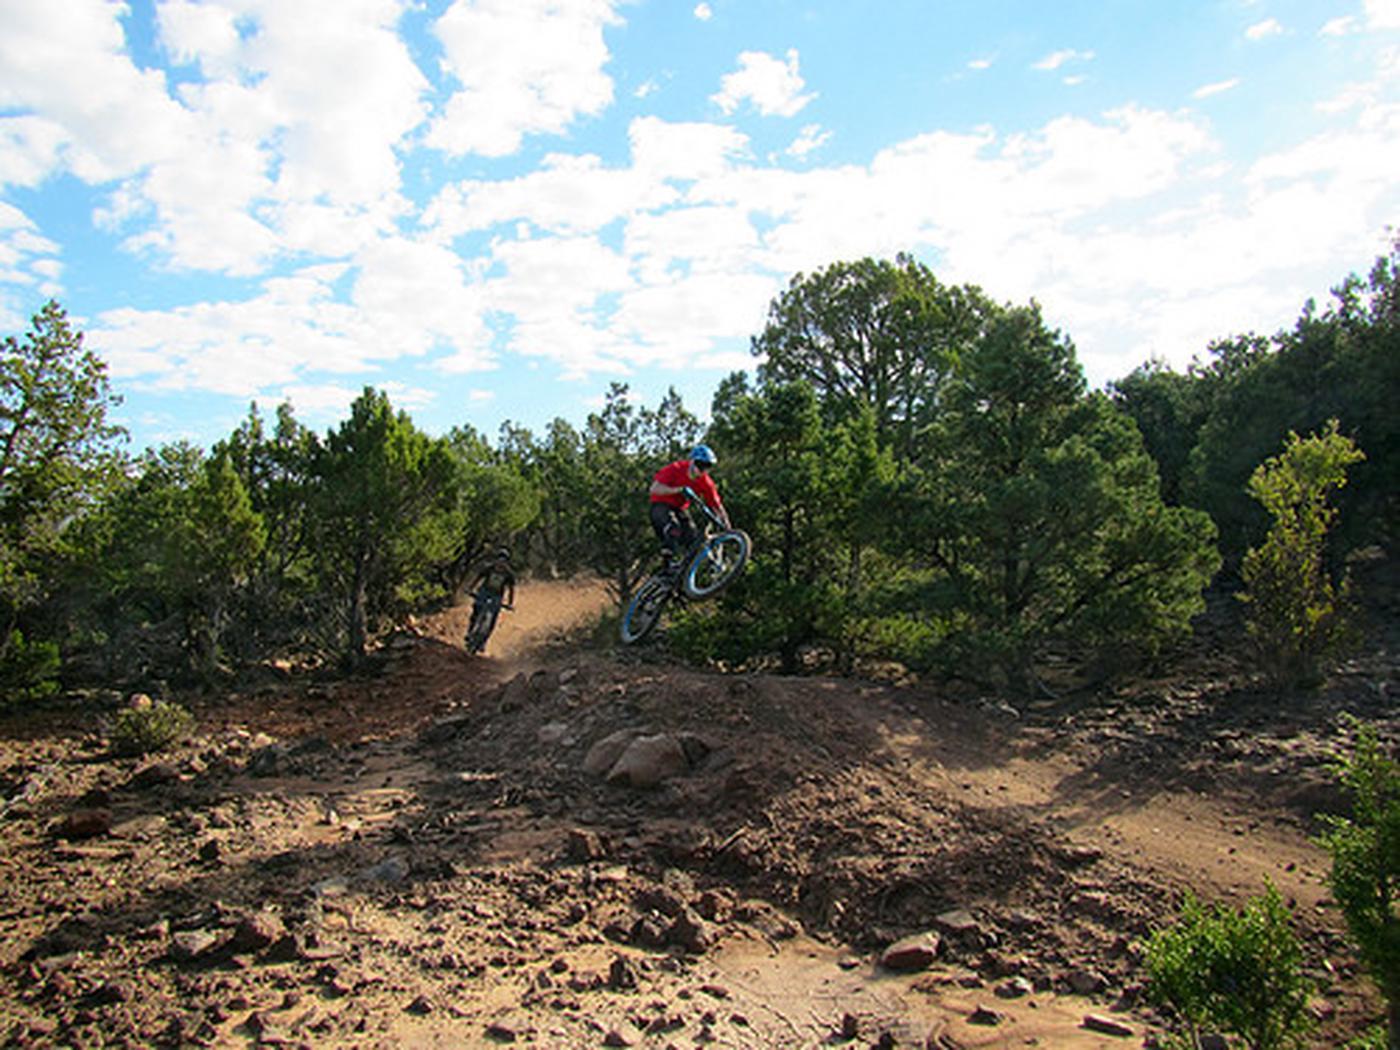 Lava Flow Trail RideMountain bikers enjoy the Table Top Lava Trail. Credit: Ceder City Field Office, UT.